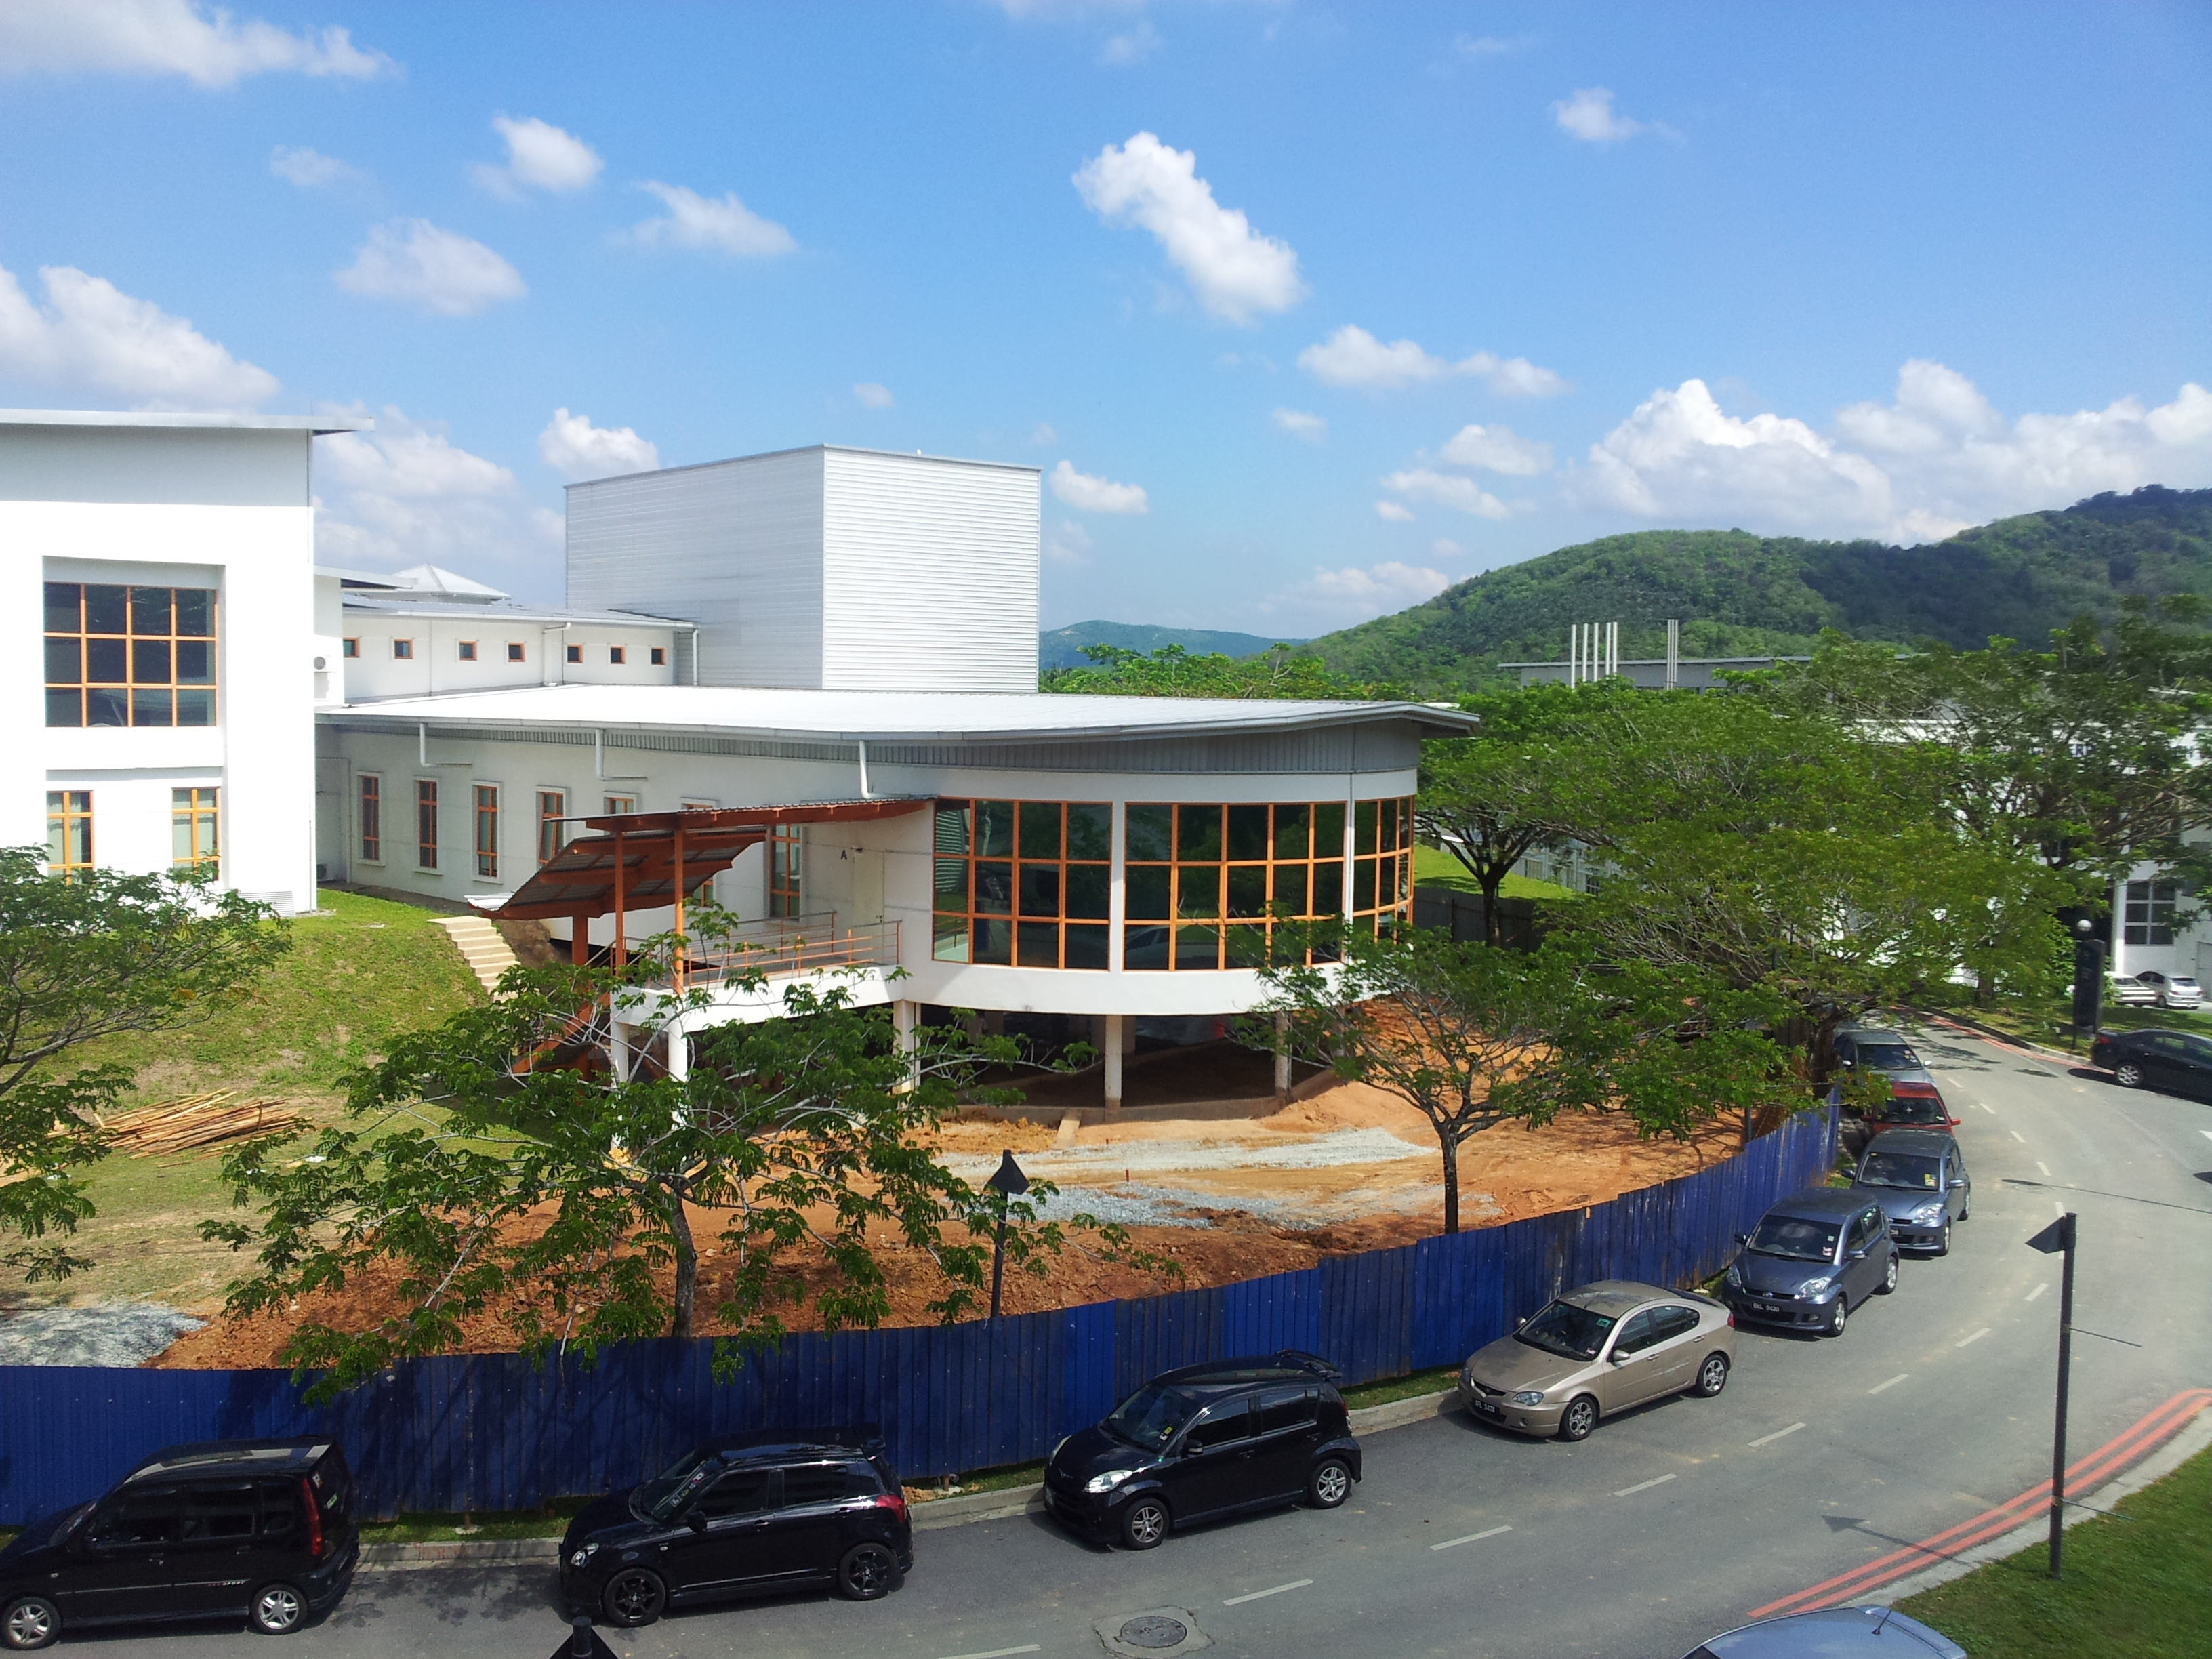 File:Block E, The University of Nottingham Malaysia Campus.jpg - Wikimedia Commons